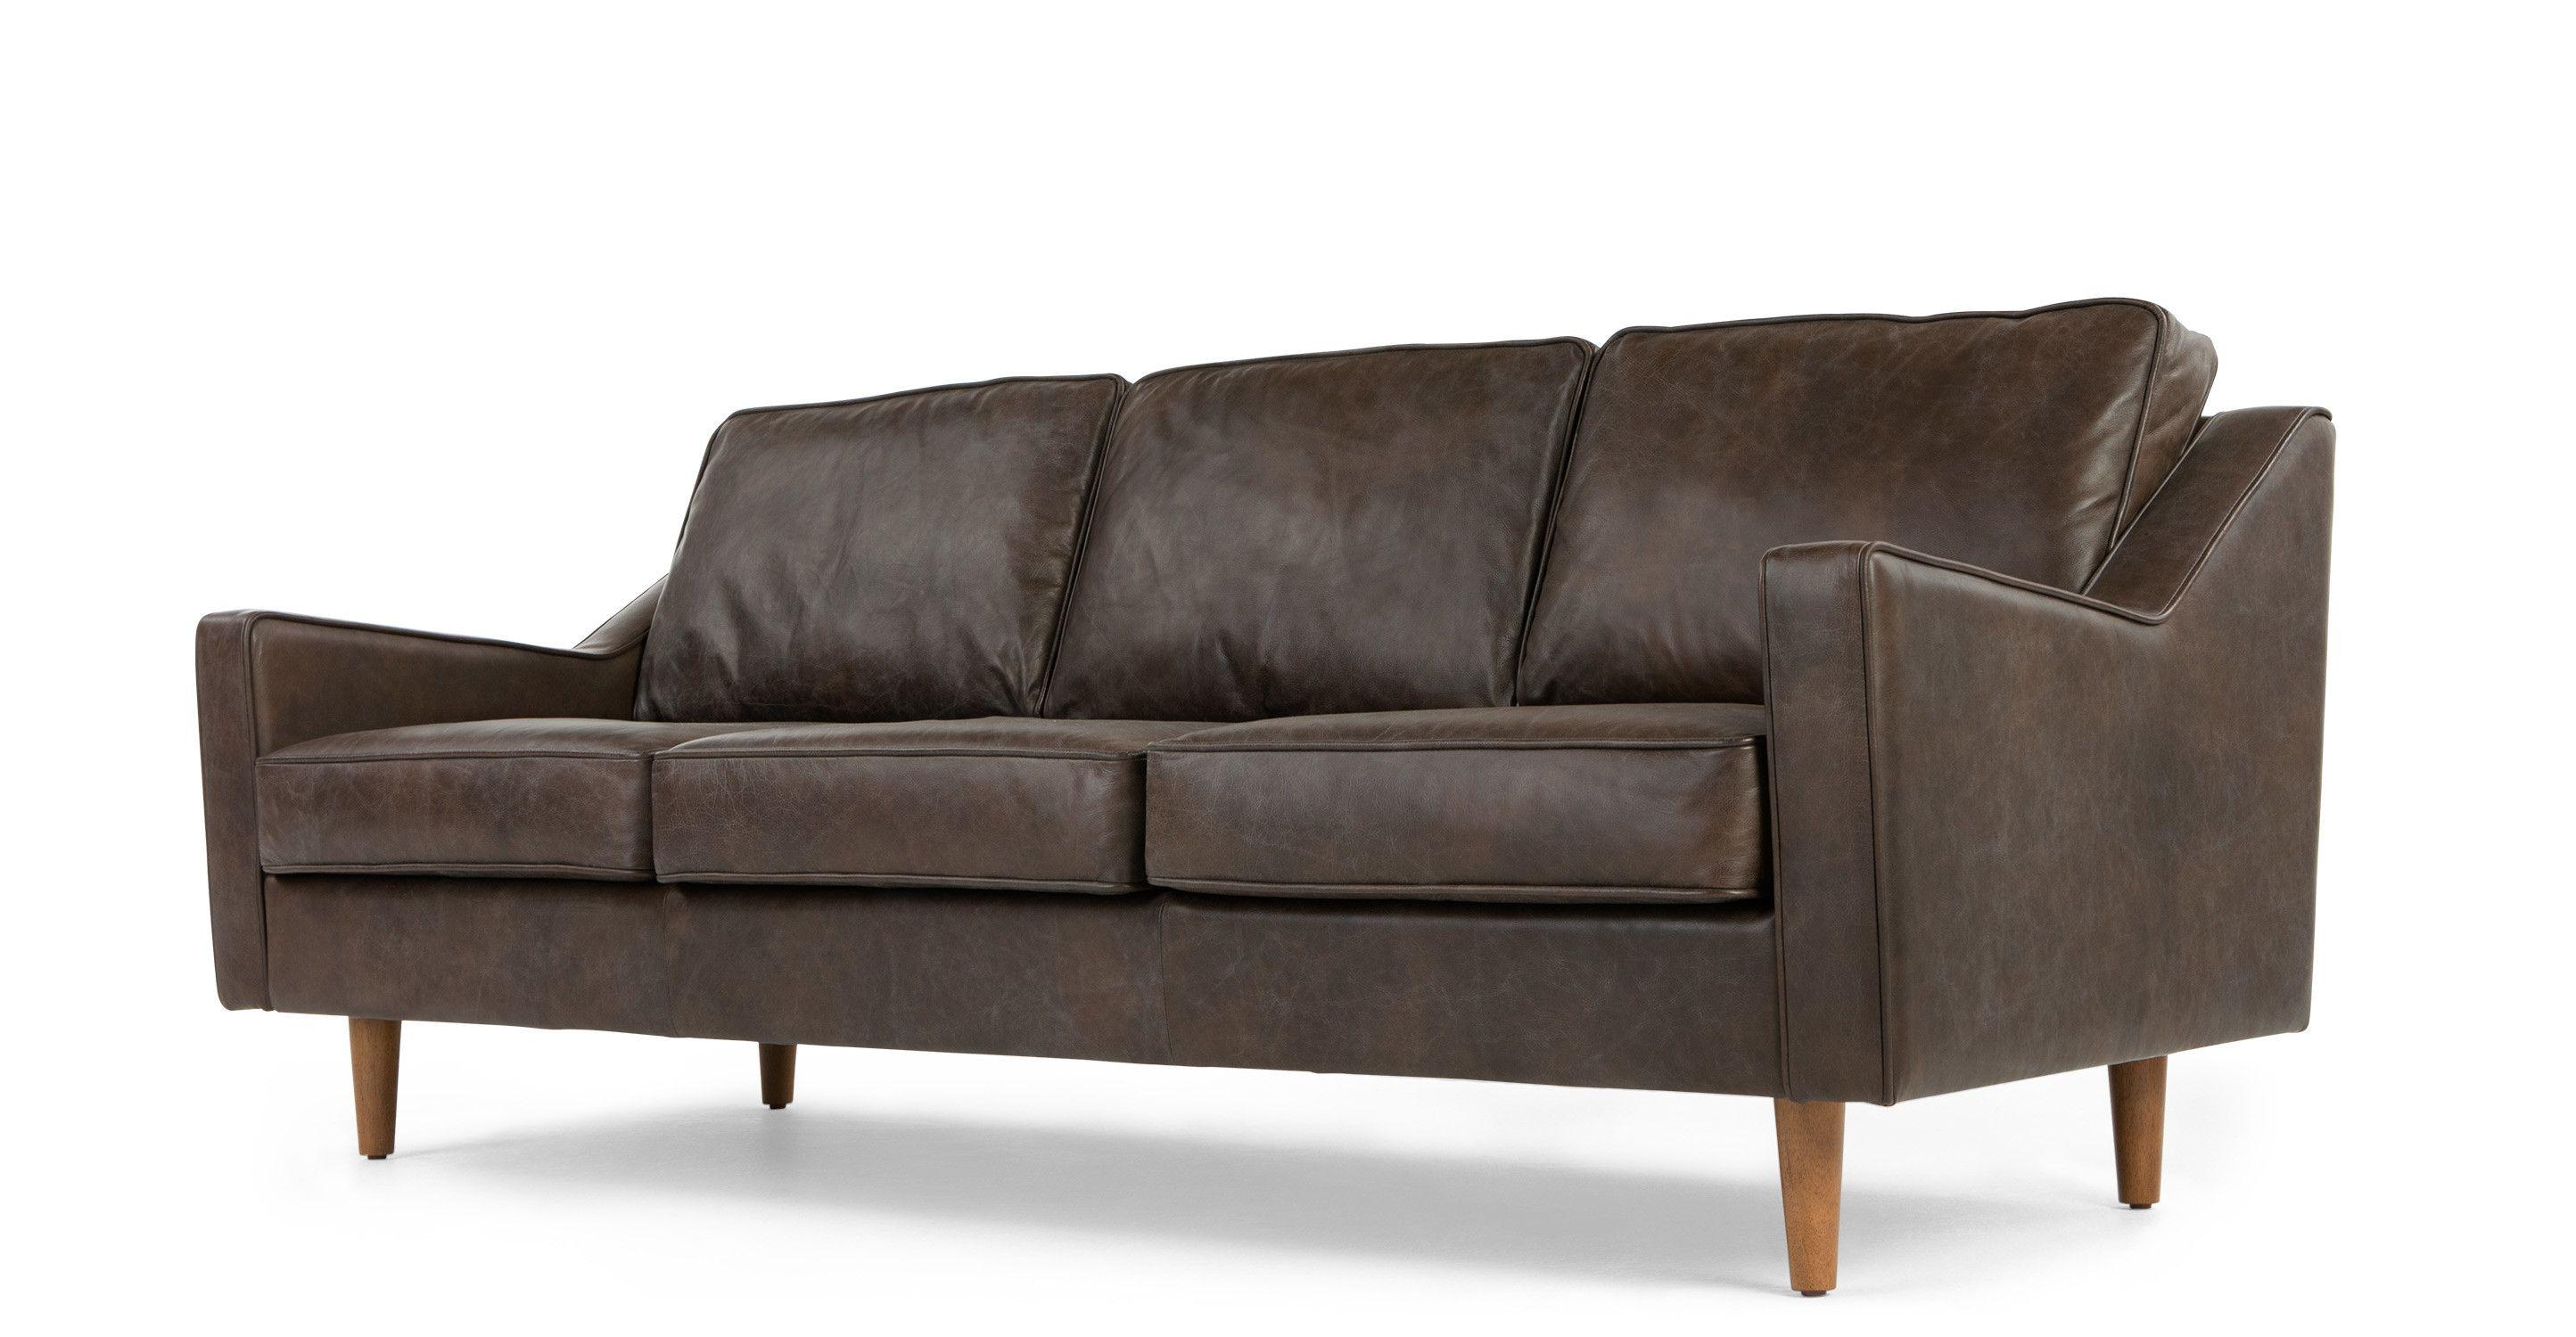 Best Dallas 3 Seater Sofa Oxford Brown Premium Leather 3 640 x 480